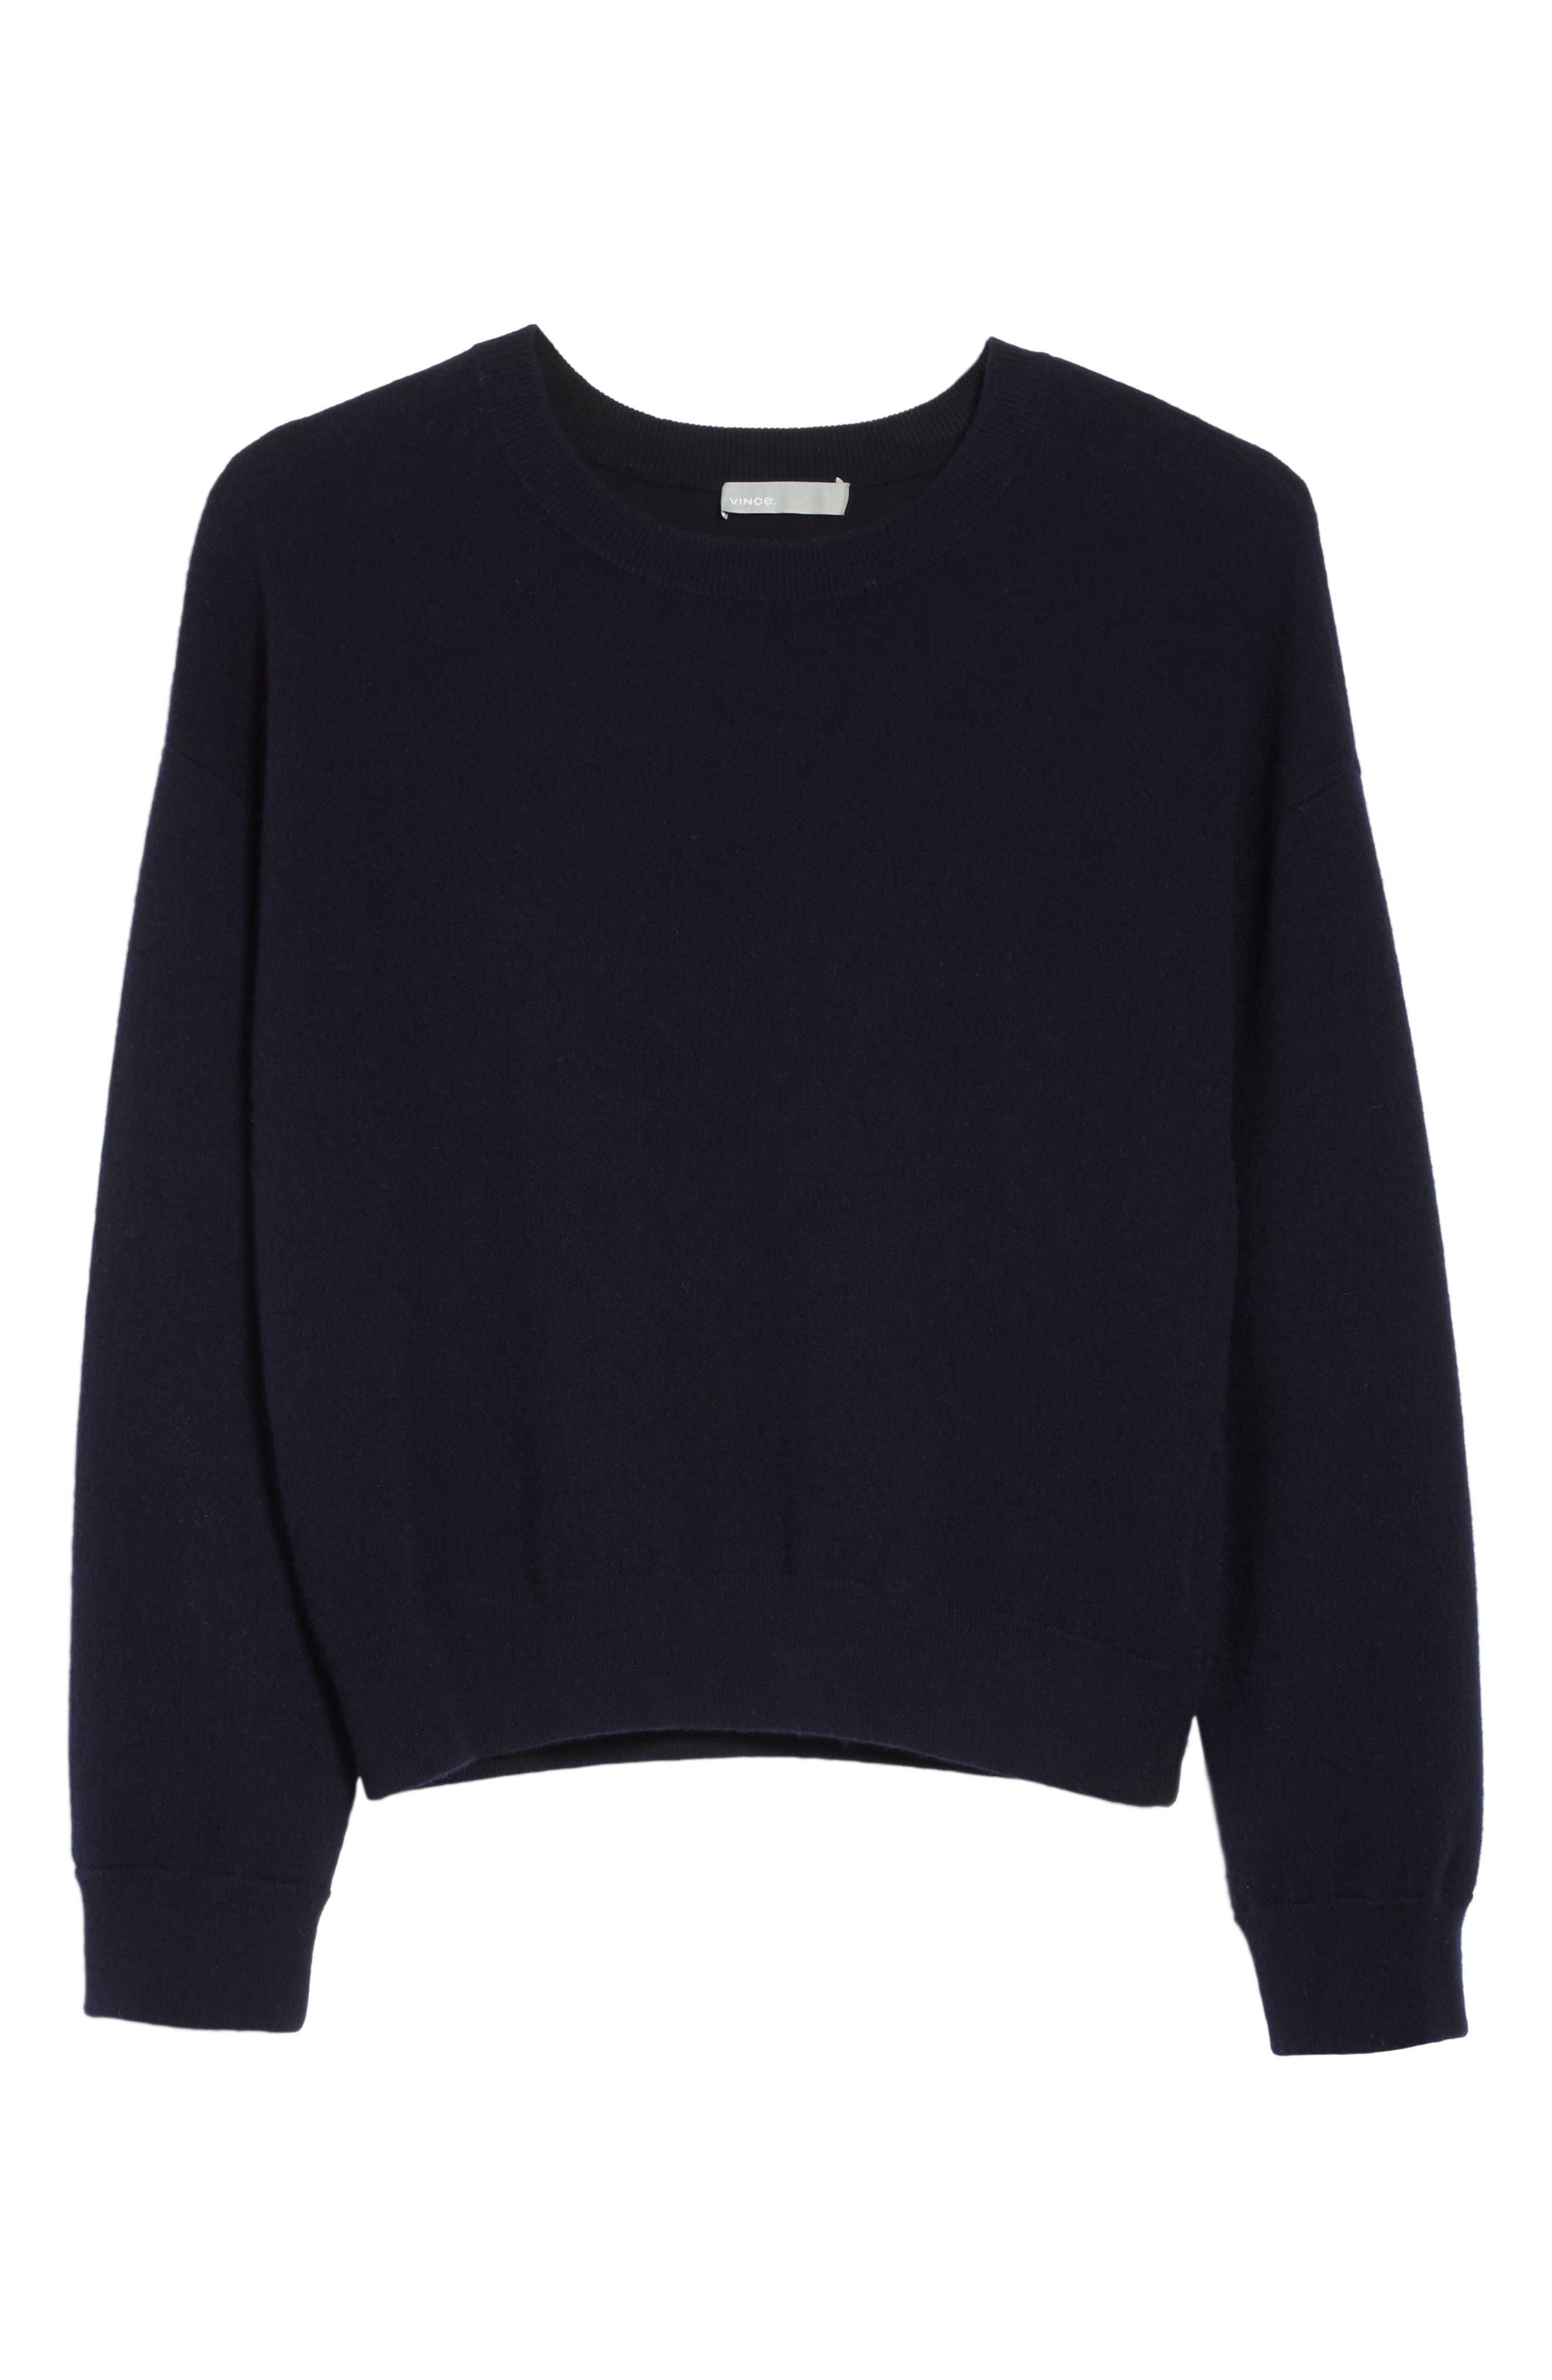 Double Layer Cashmere & Cotton Sweater,                             Alternate thumbnail 6, color,                             Coastal/ Black